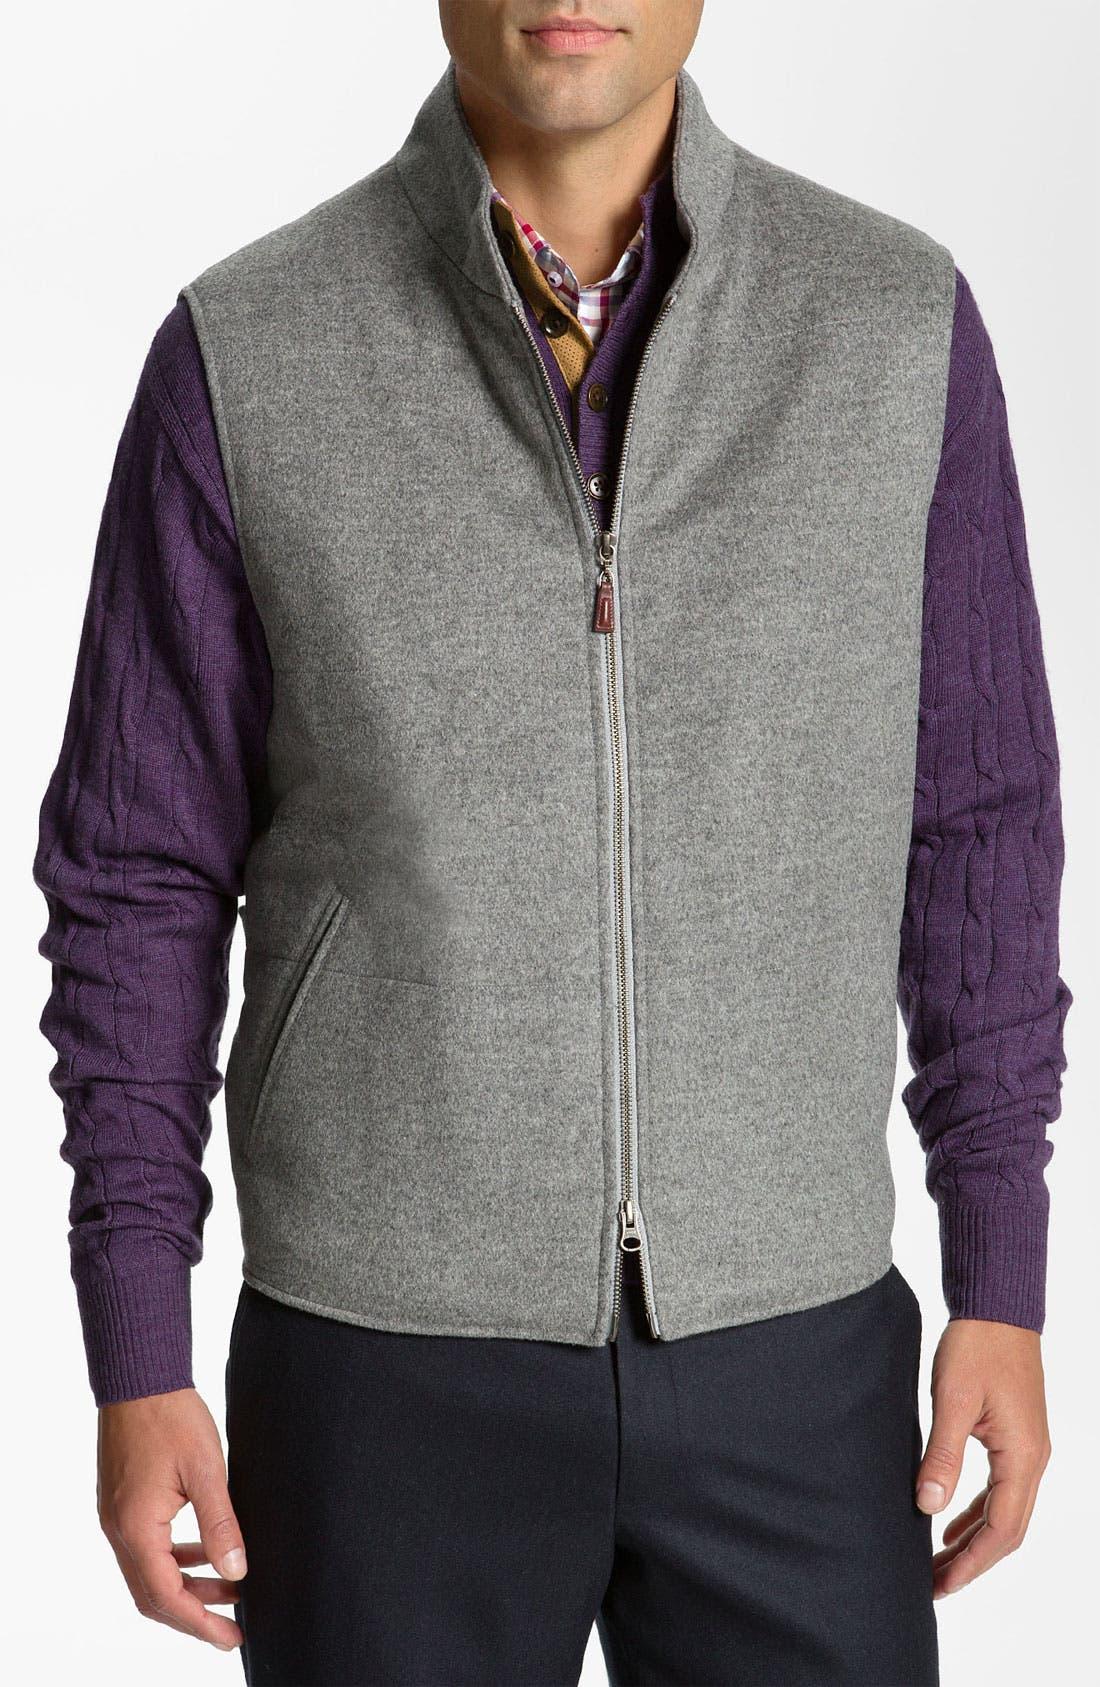 Main Image - Peter Millar Wool & Cashmere Vest